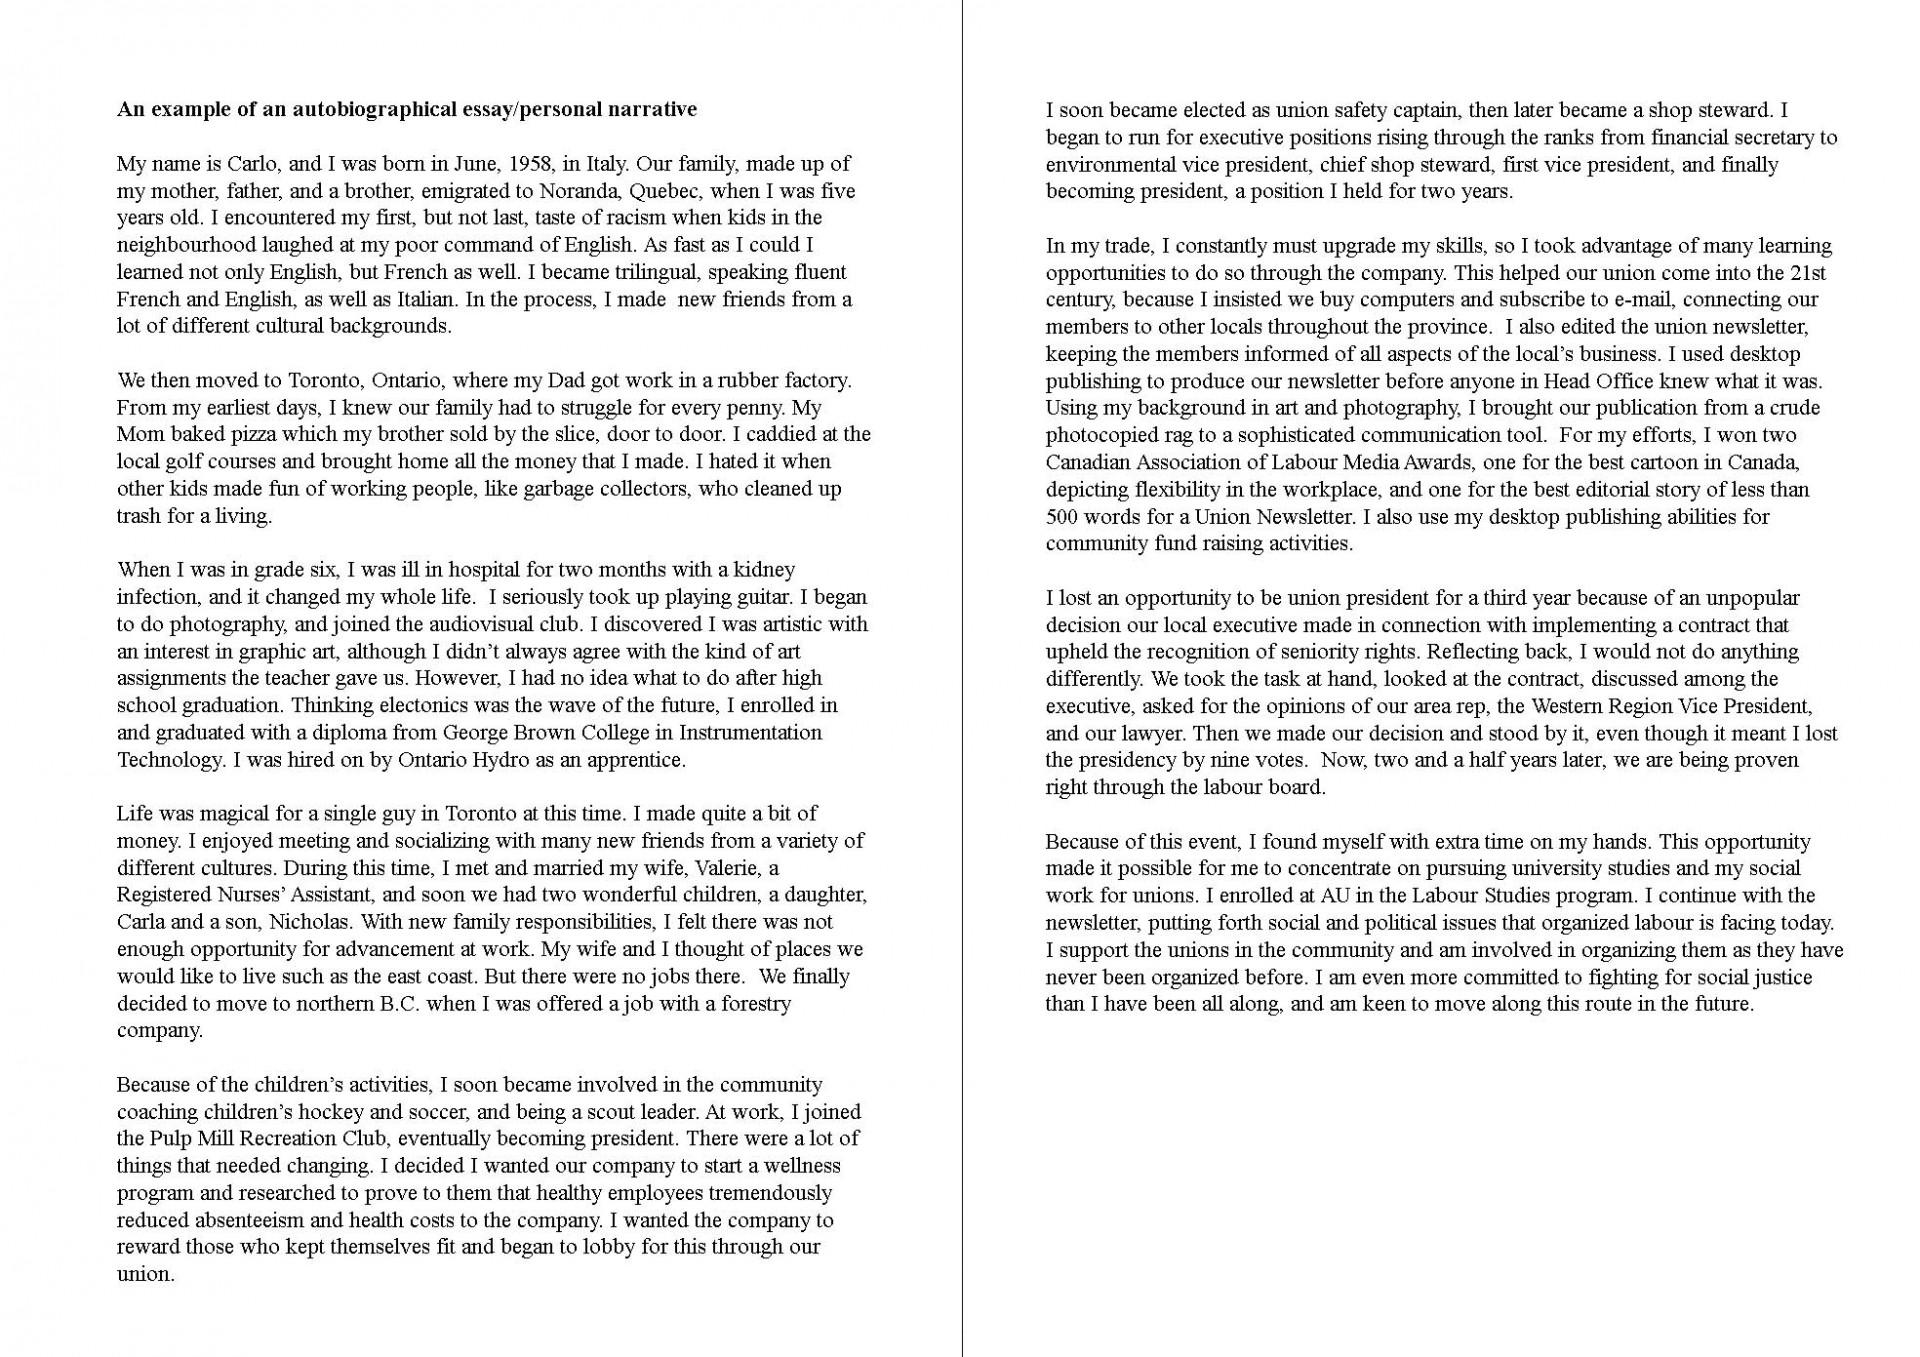 025 Good Conclusion For An Essay Sample Wondrous A Paragraph Argumentative How To Write 1920